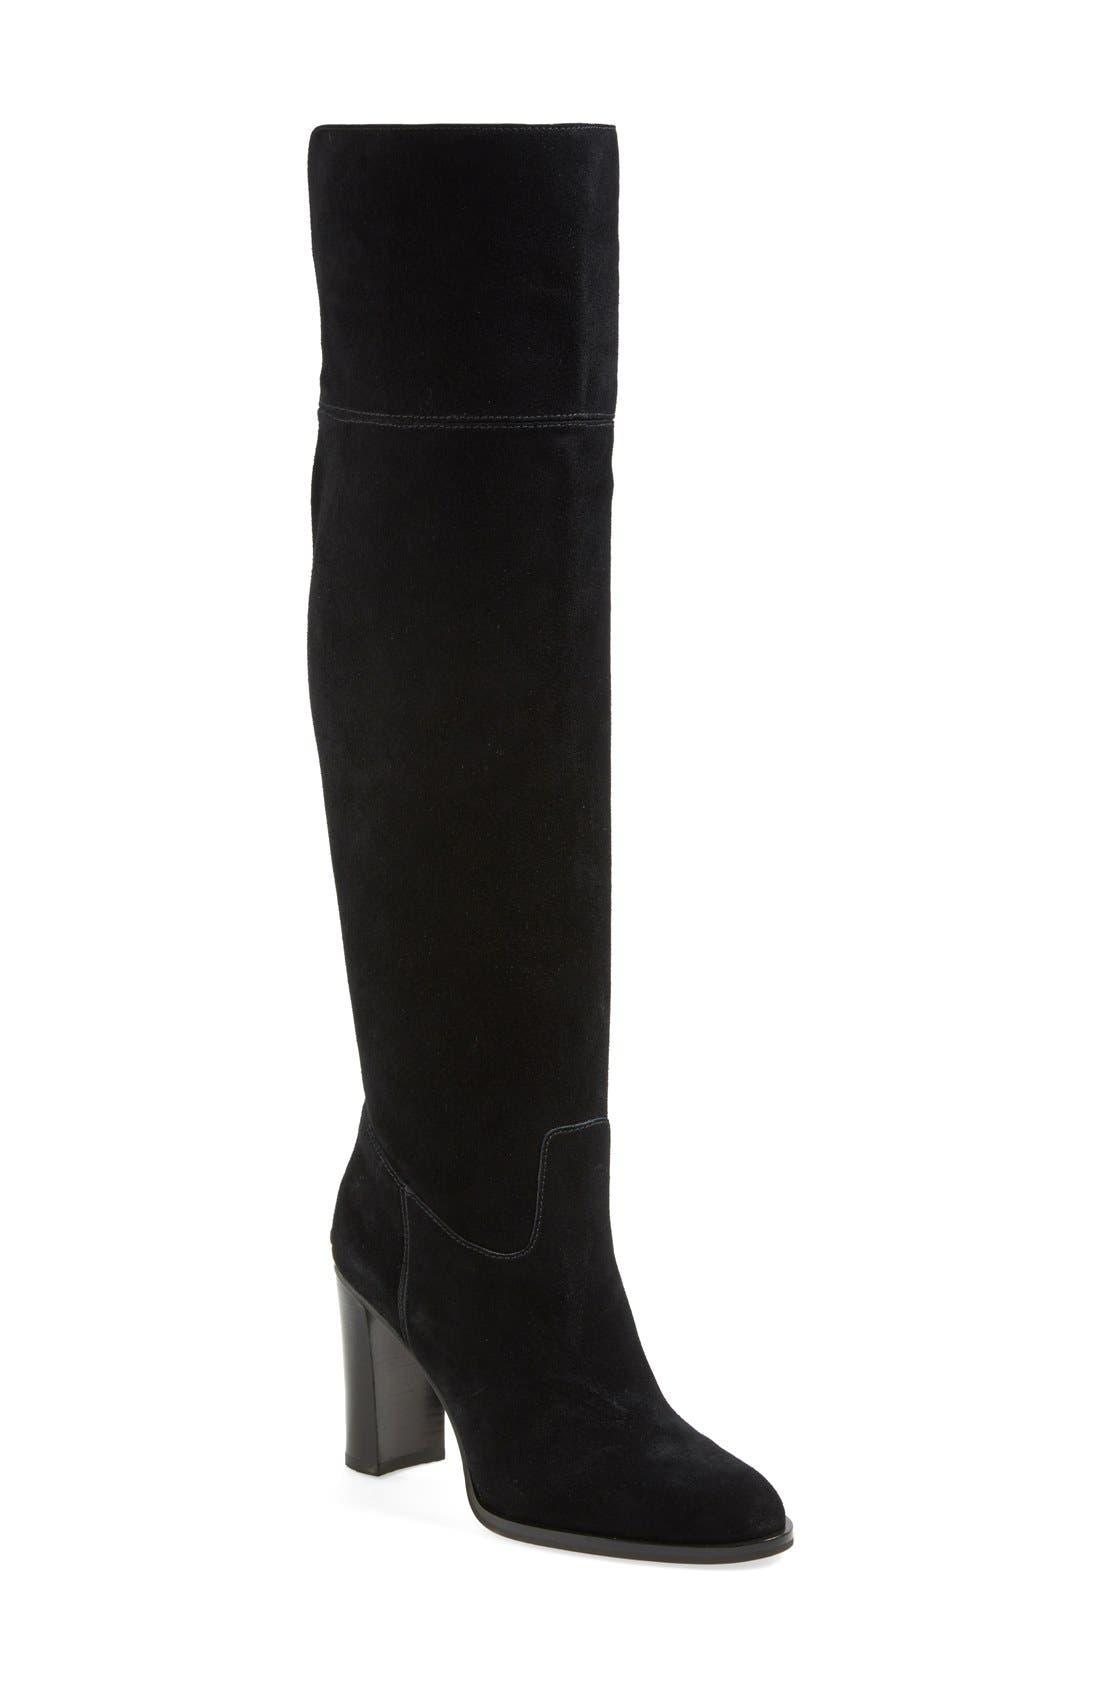 Alternate Image 1 Selected - MICHAEL Michael Kors 'Regina' Over the Knee Boot (Women)